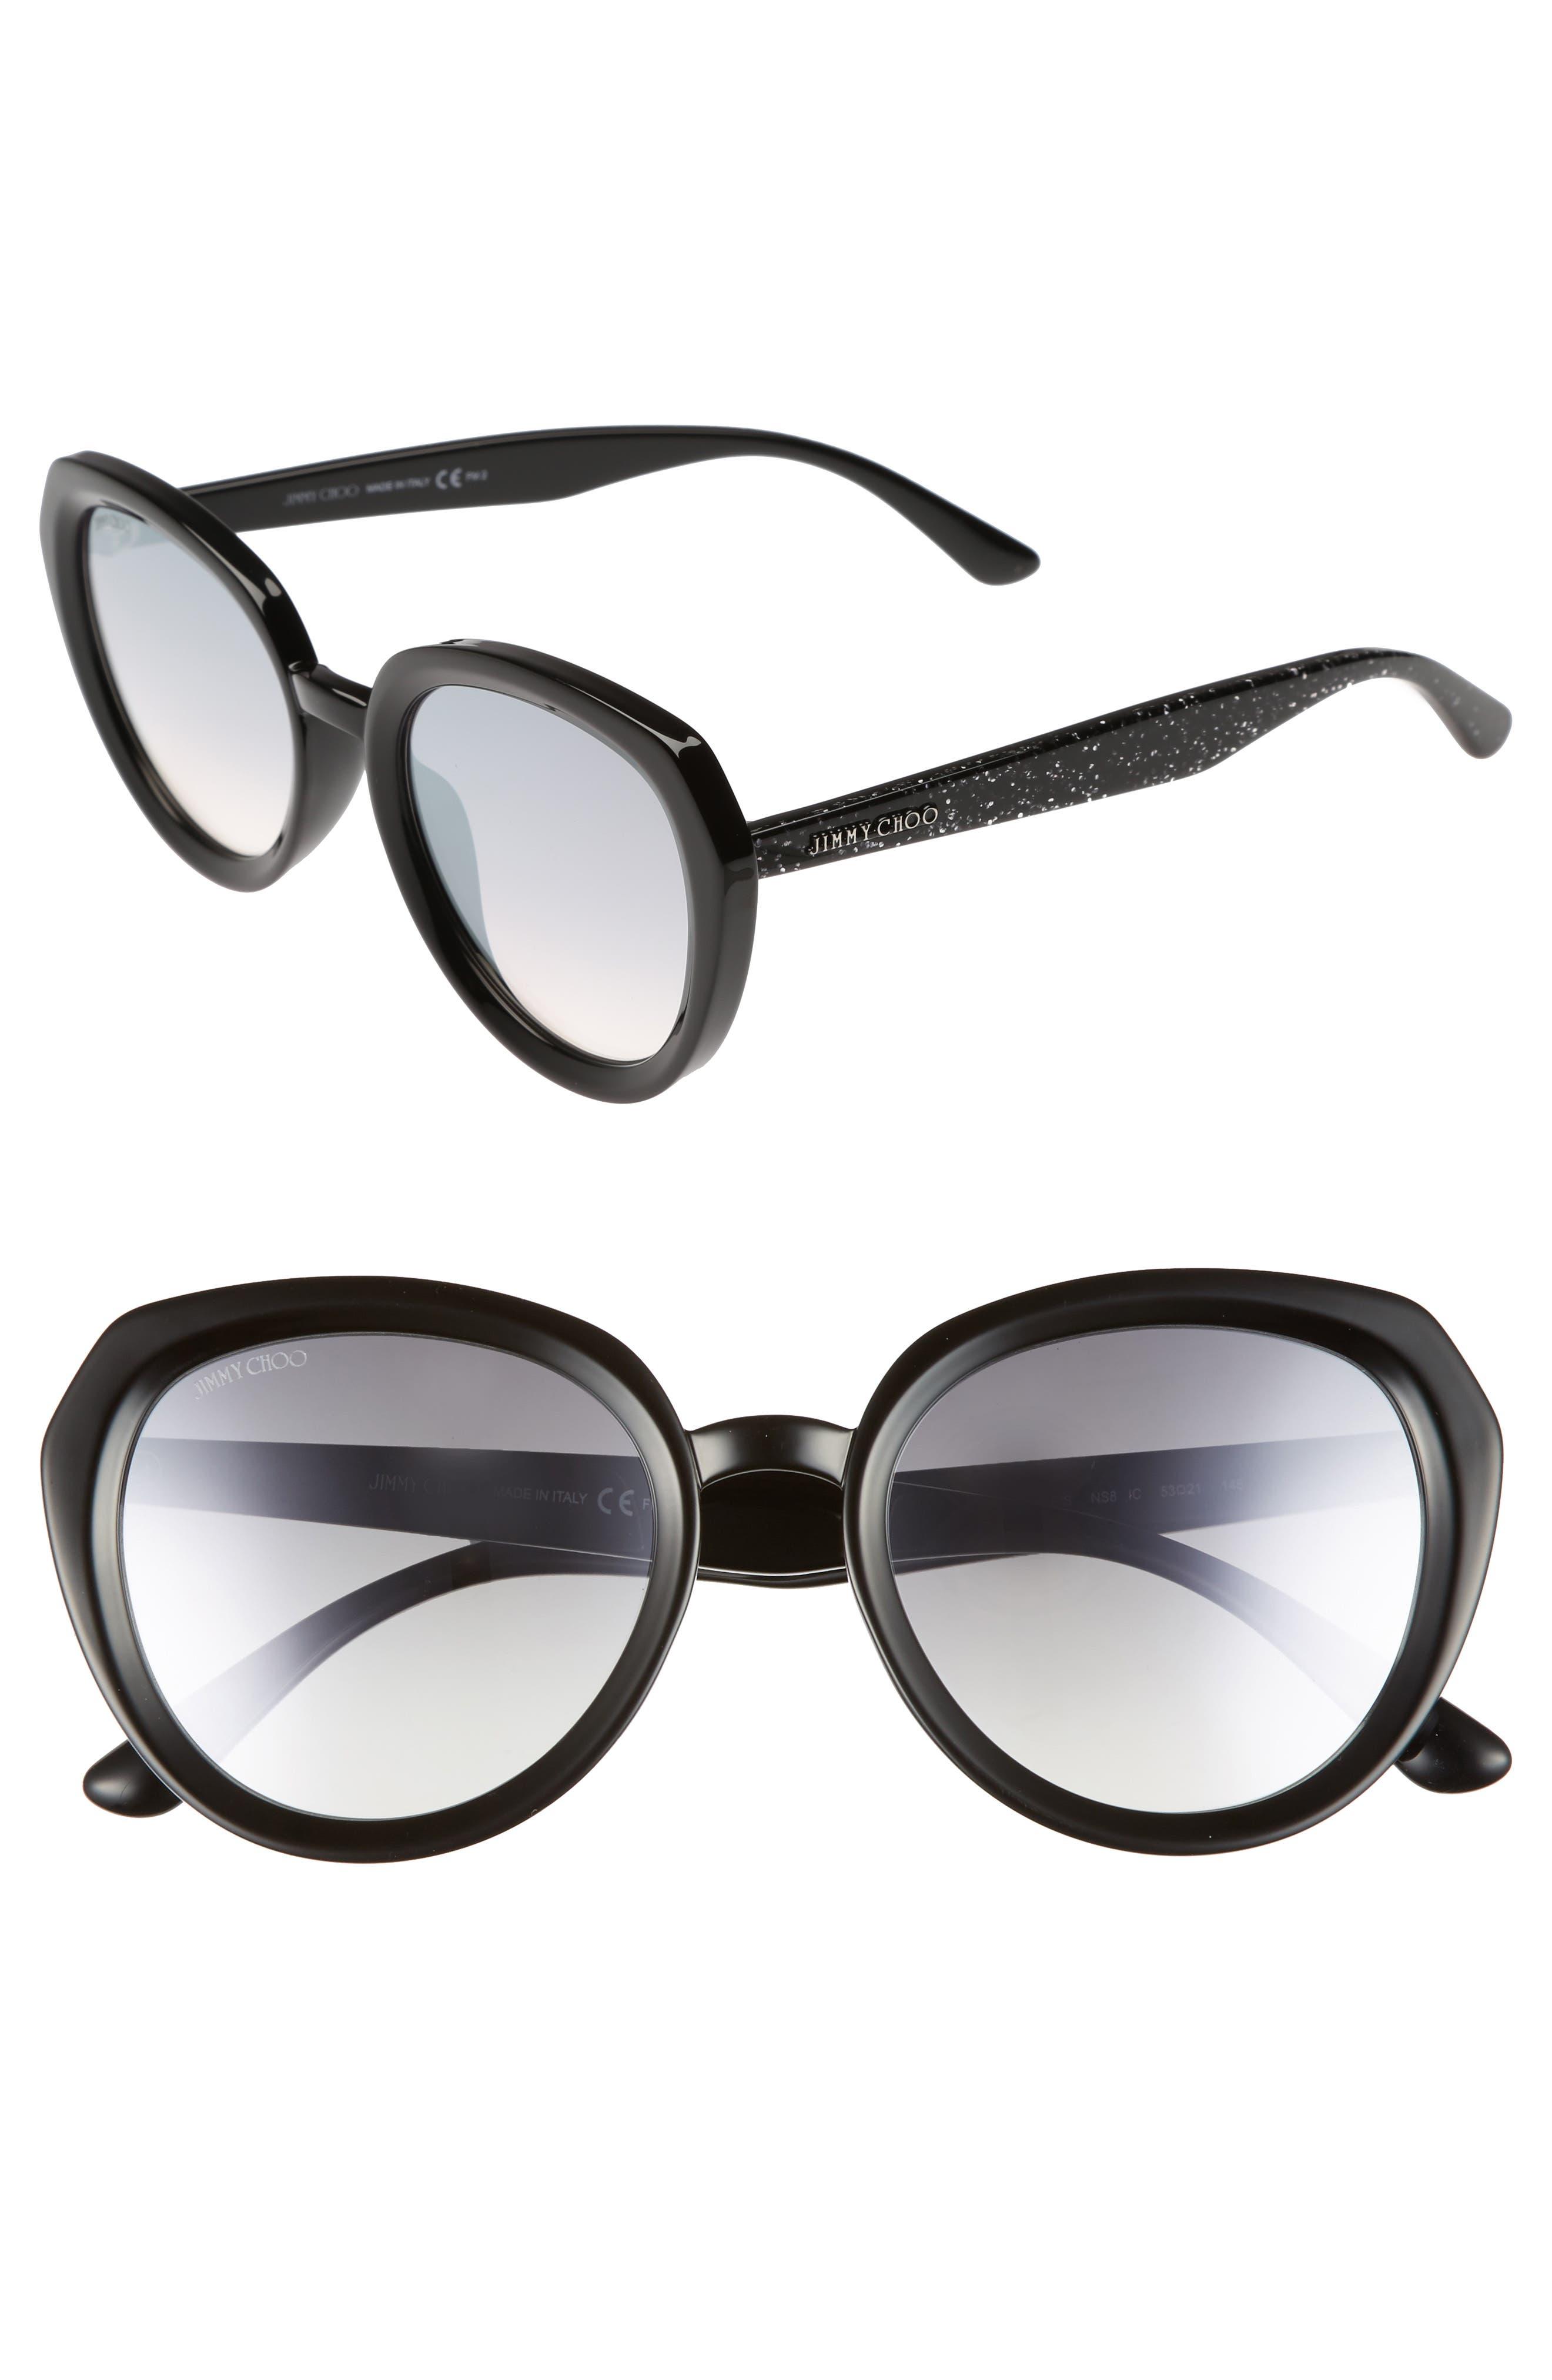 Maces 53mm Oversize Sunglasses,                             Main thumbnail 1, color,                             BLACK GLITTER